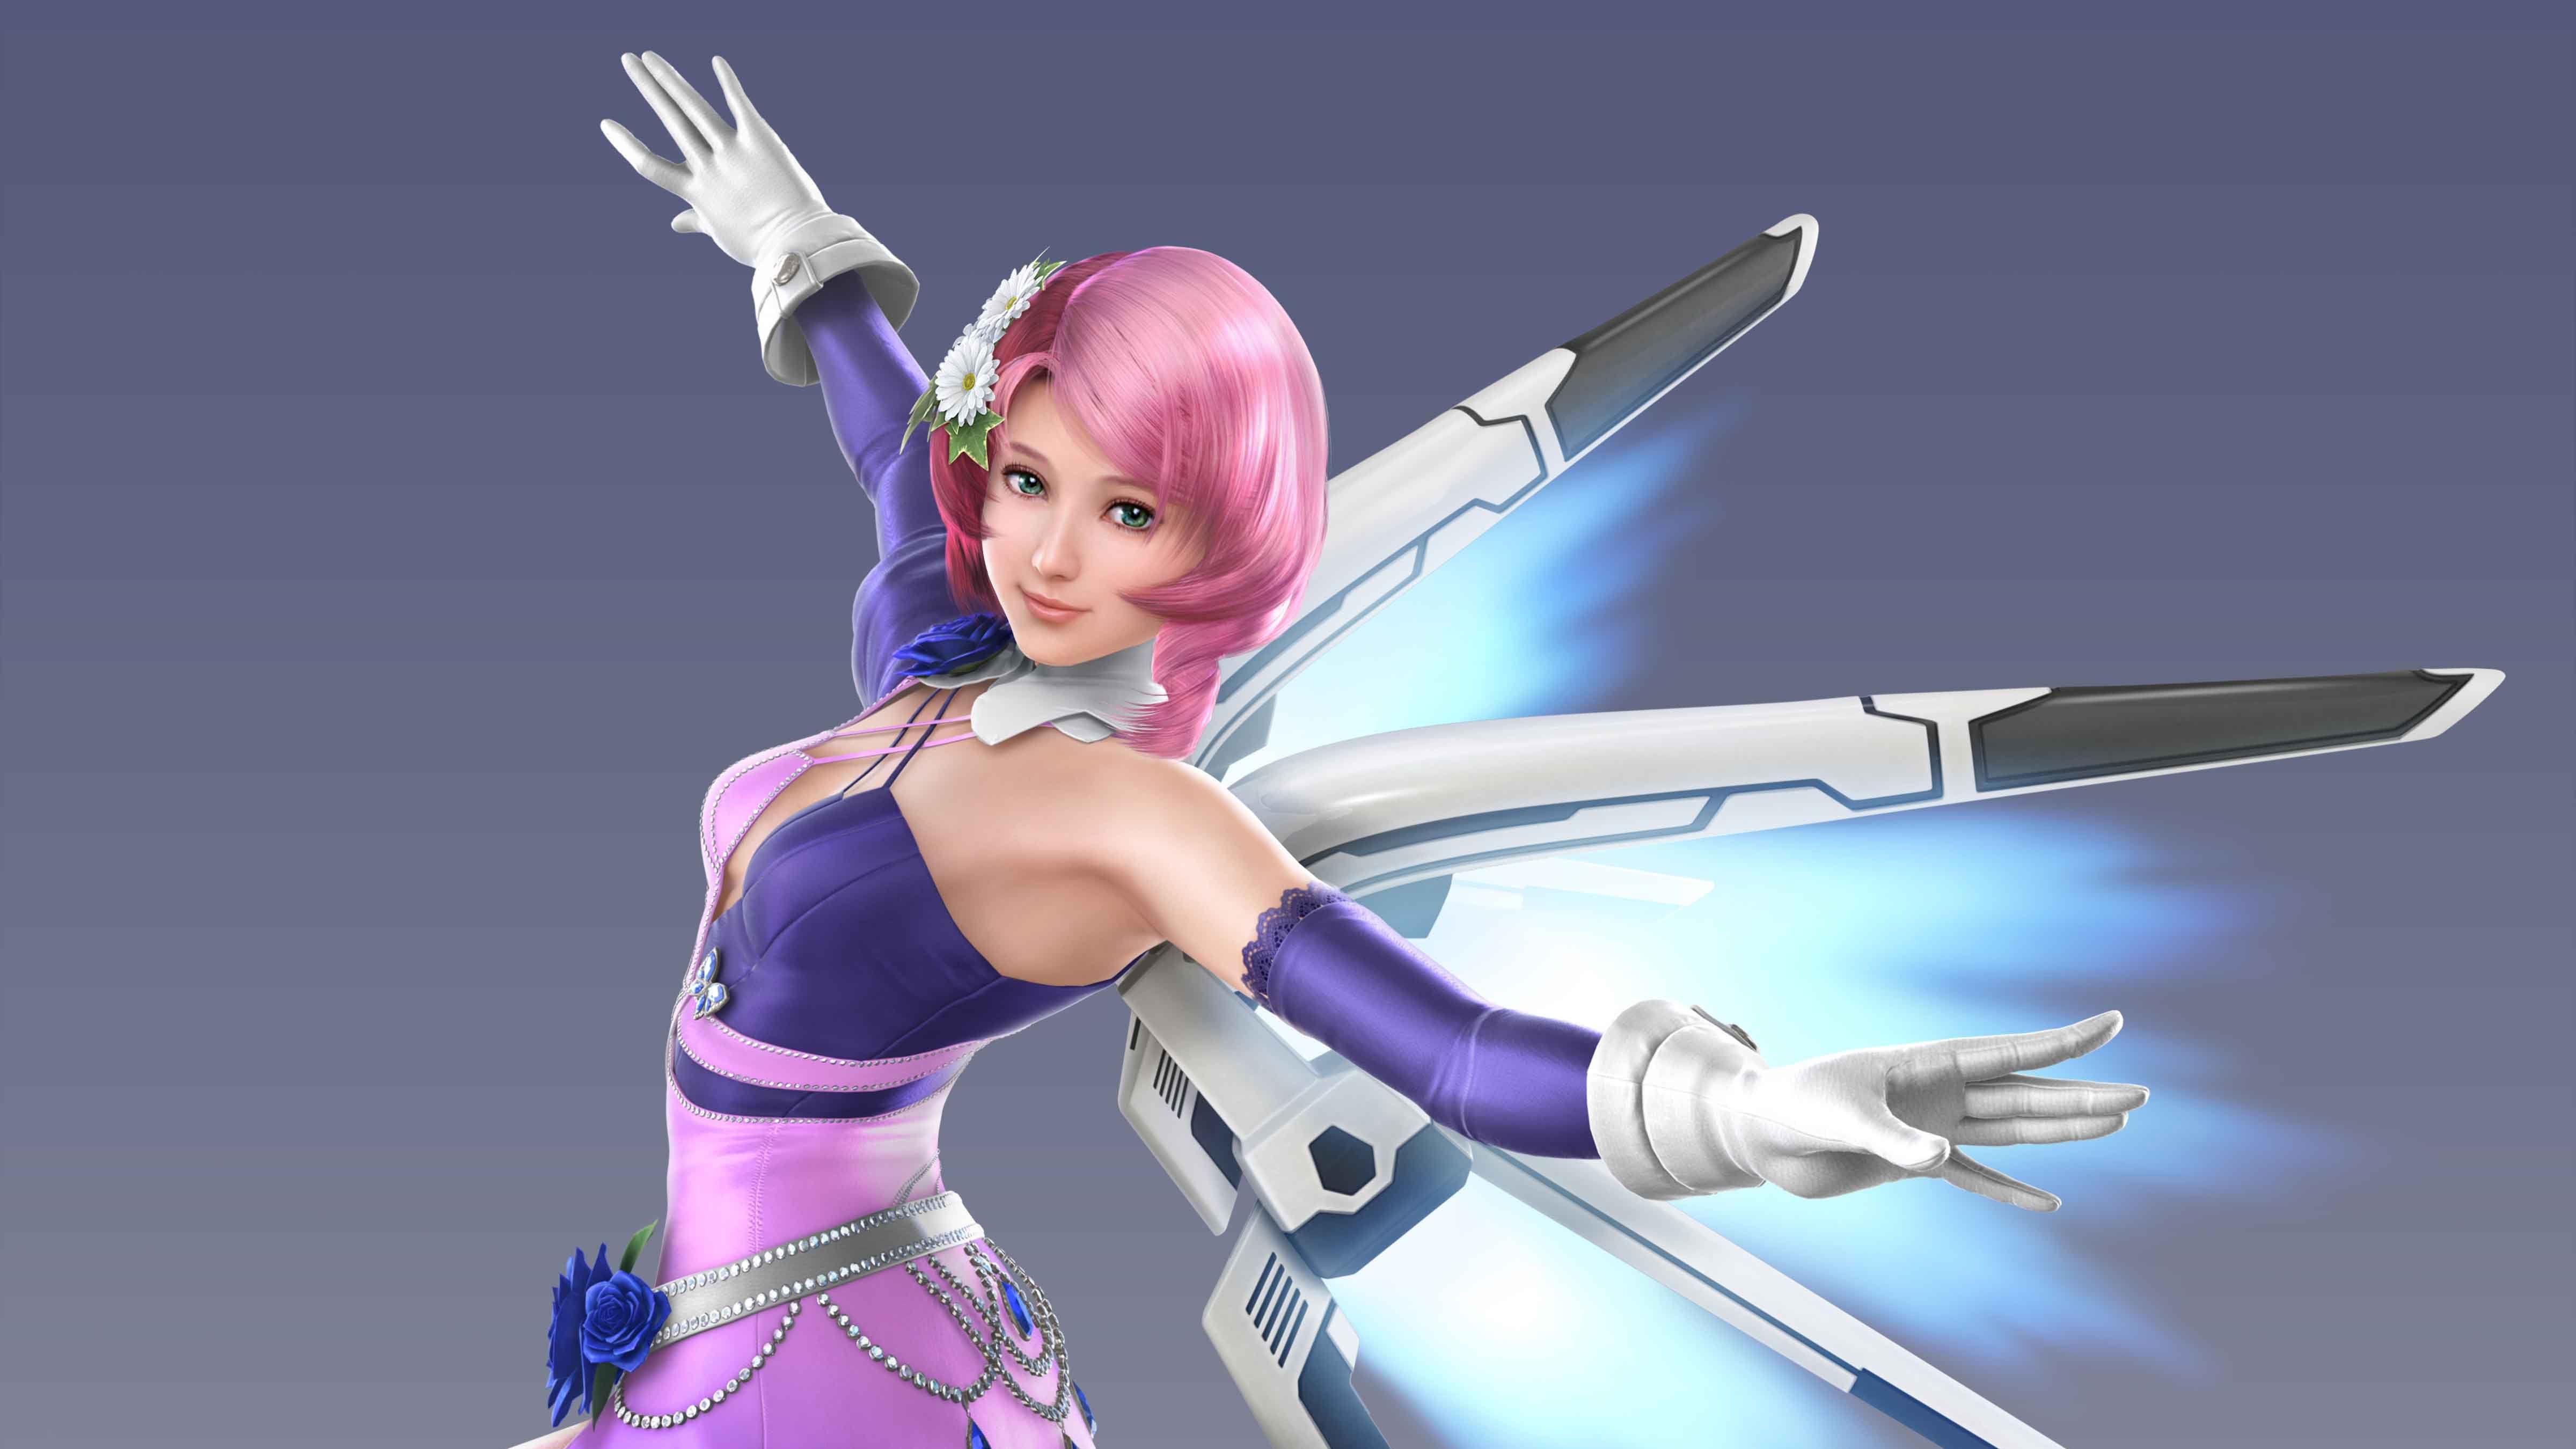 Pink Haired Female Anime Character Digital Wallpaper Alisa